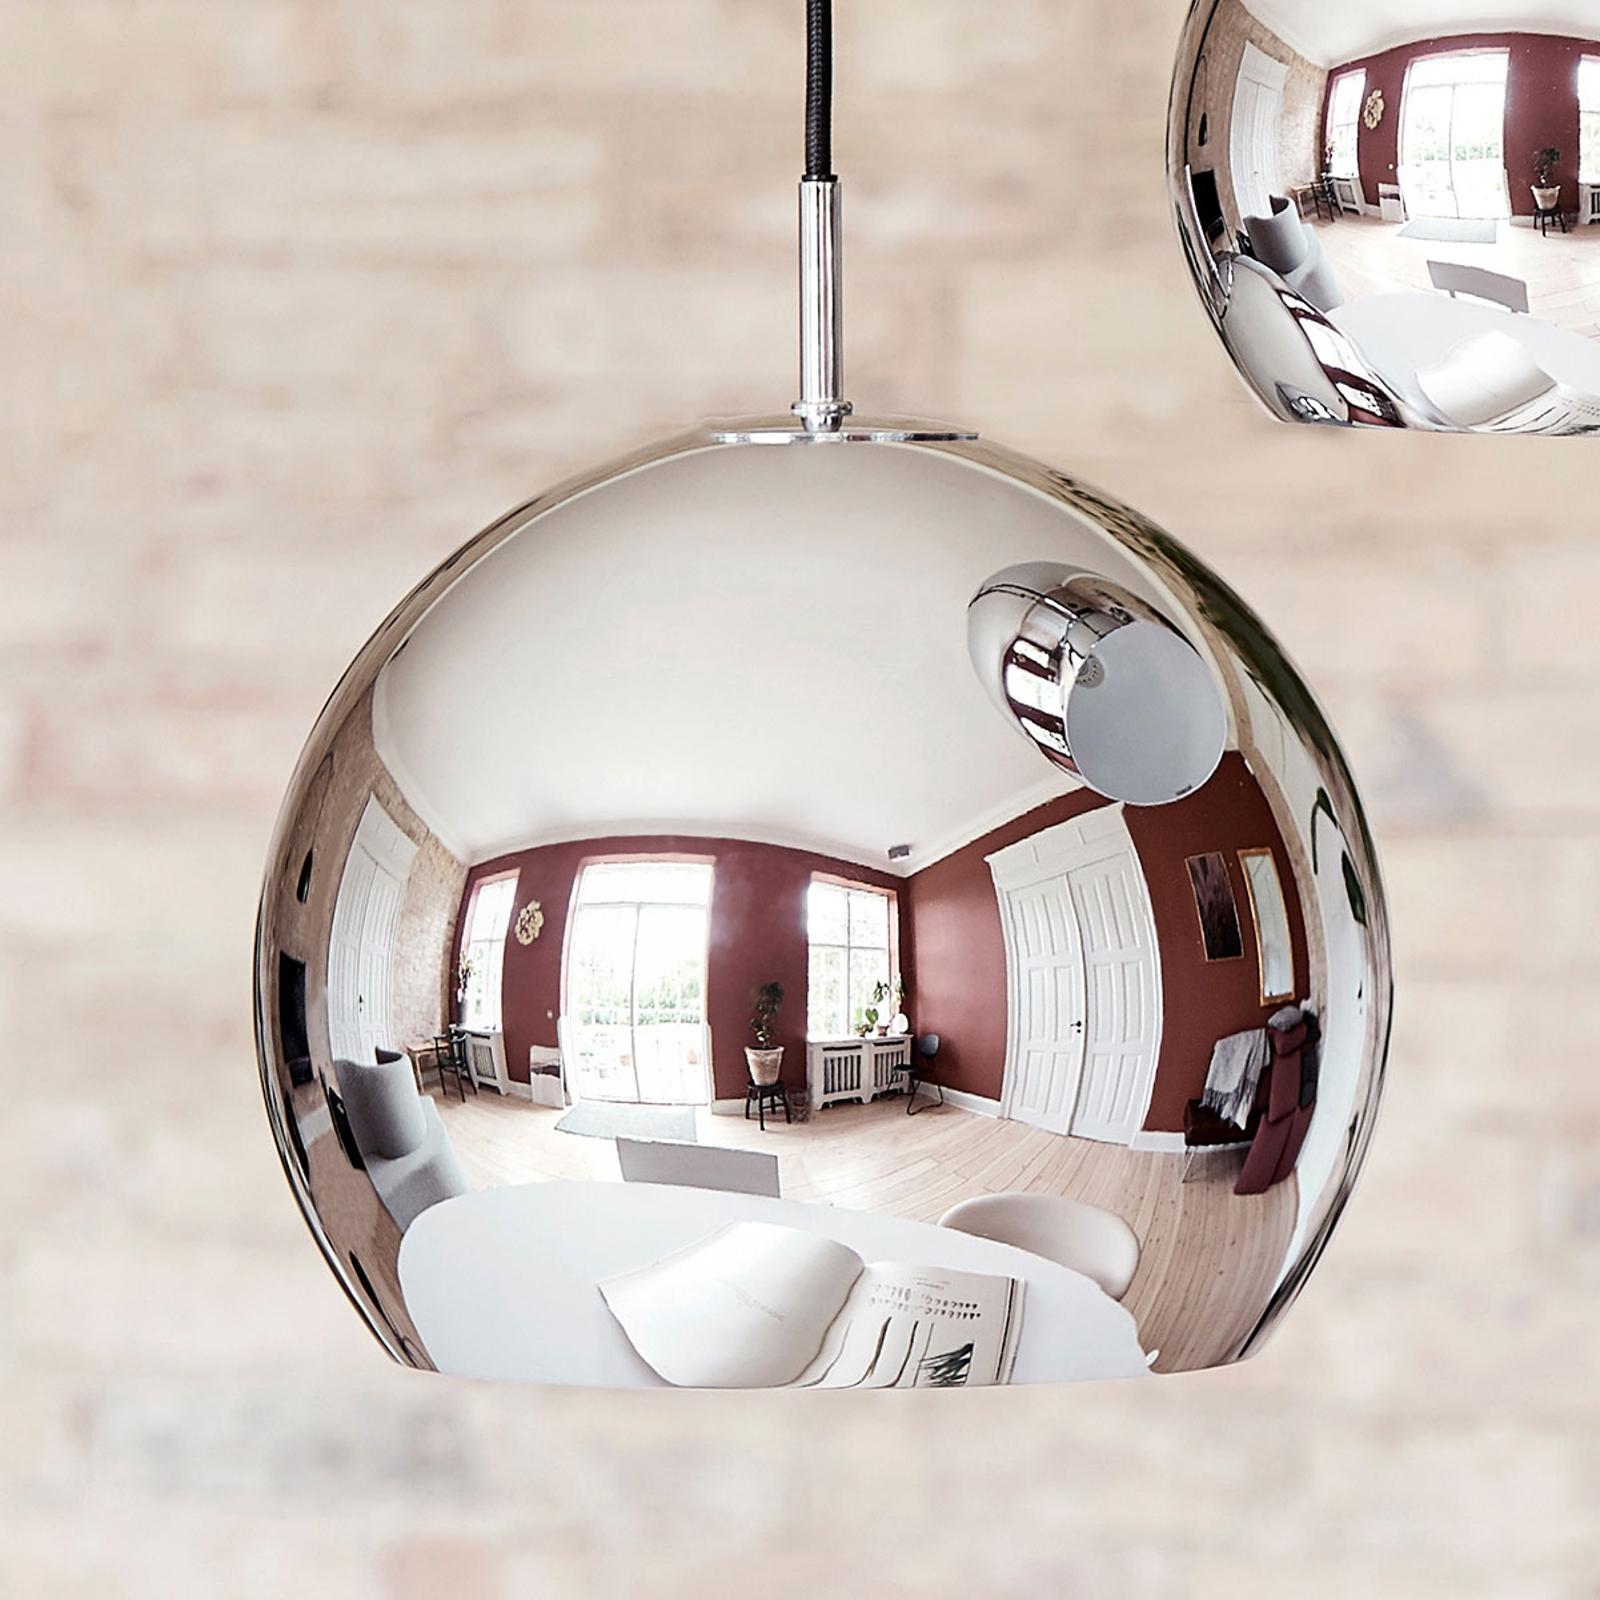 FRANDSEN Ball Hängelampe, Ø 25 cm, chrom glänzend